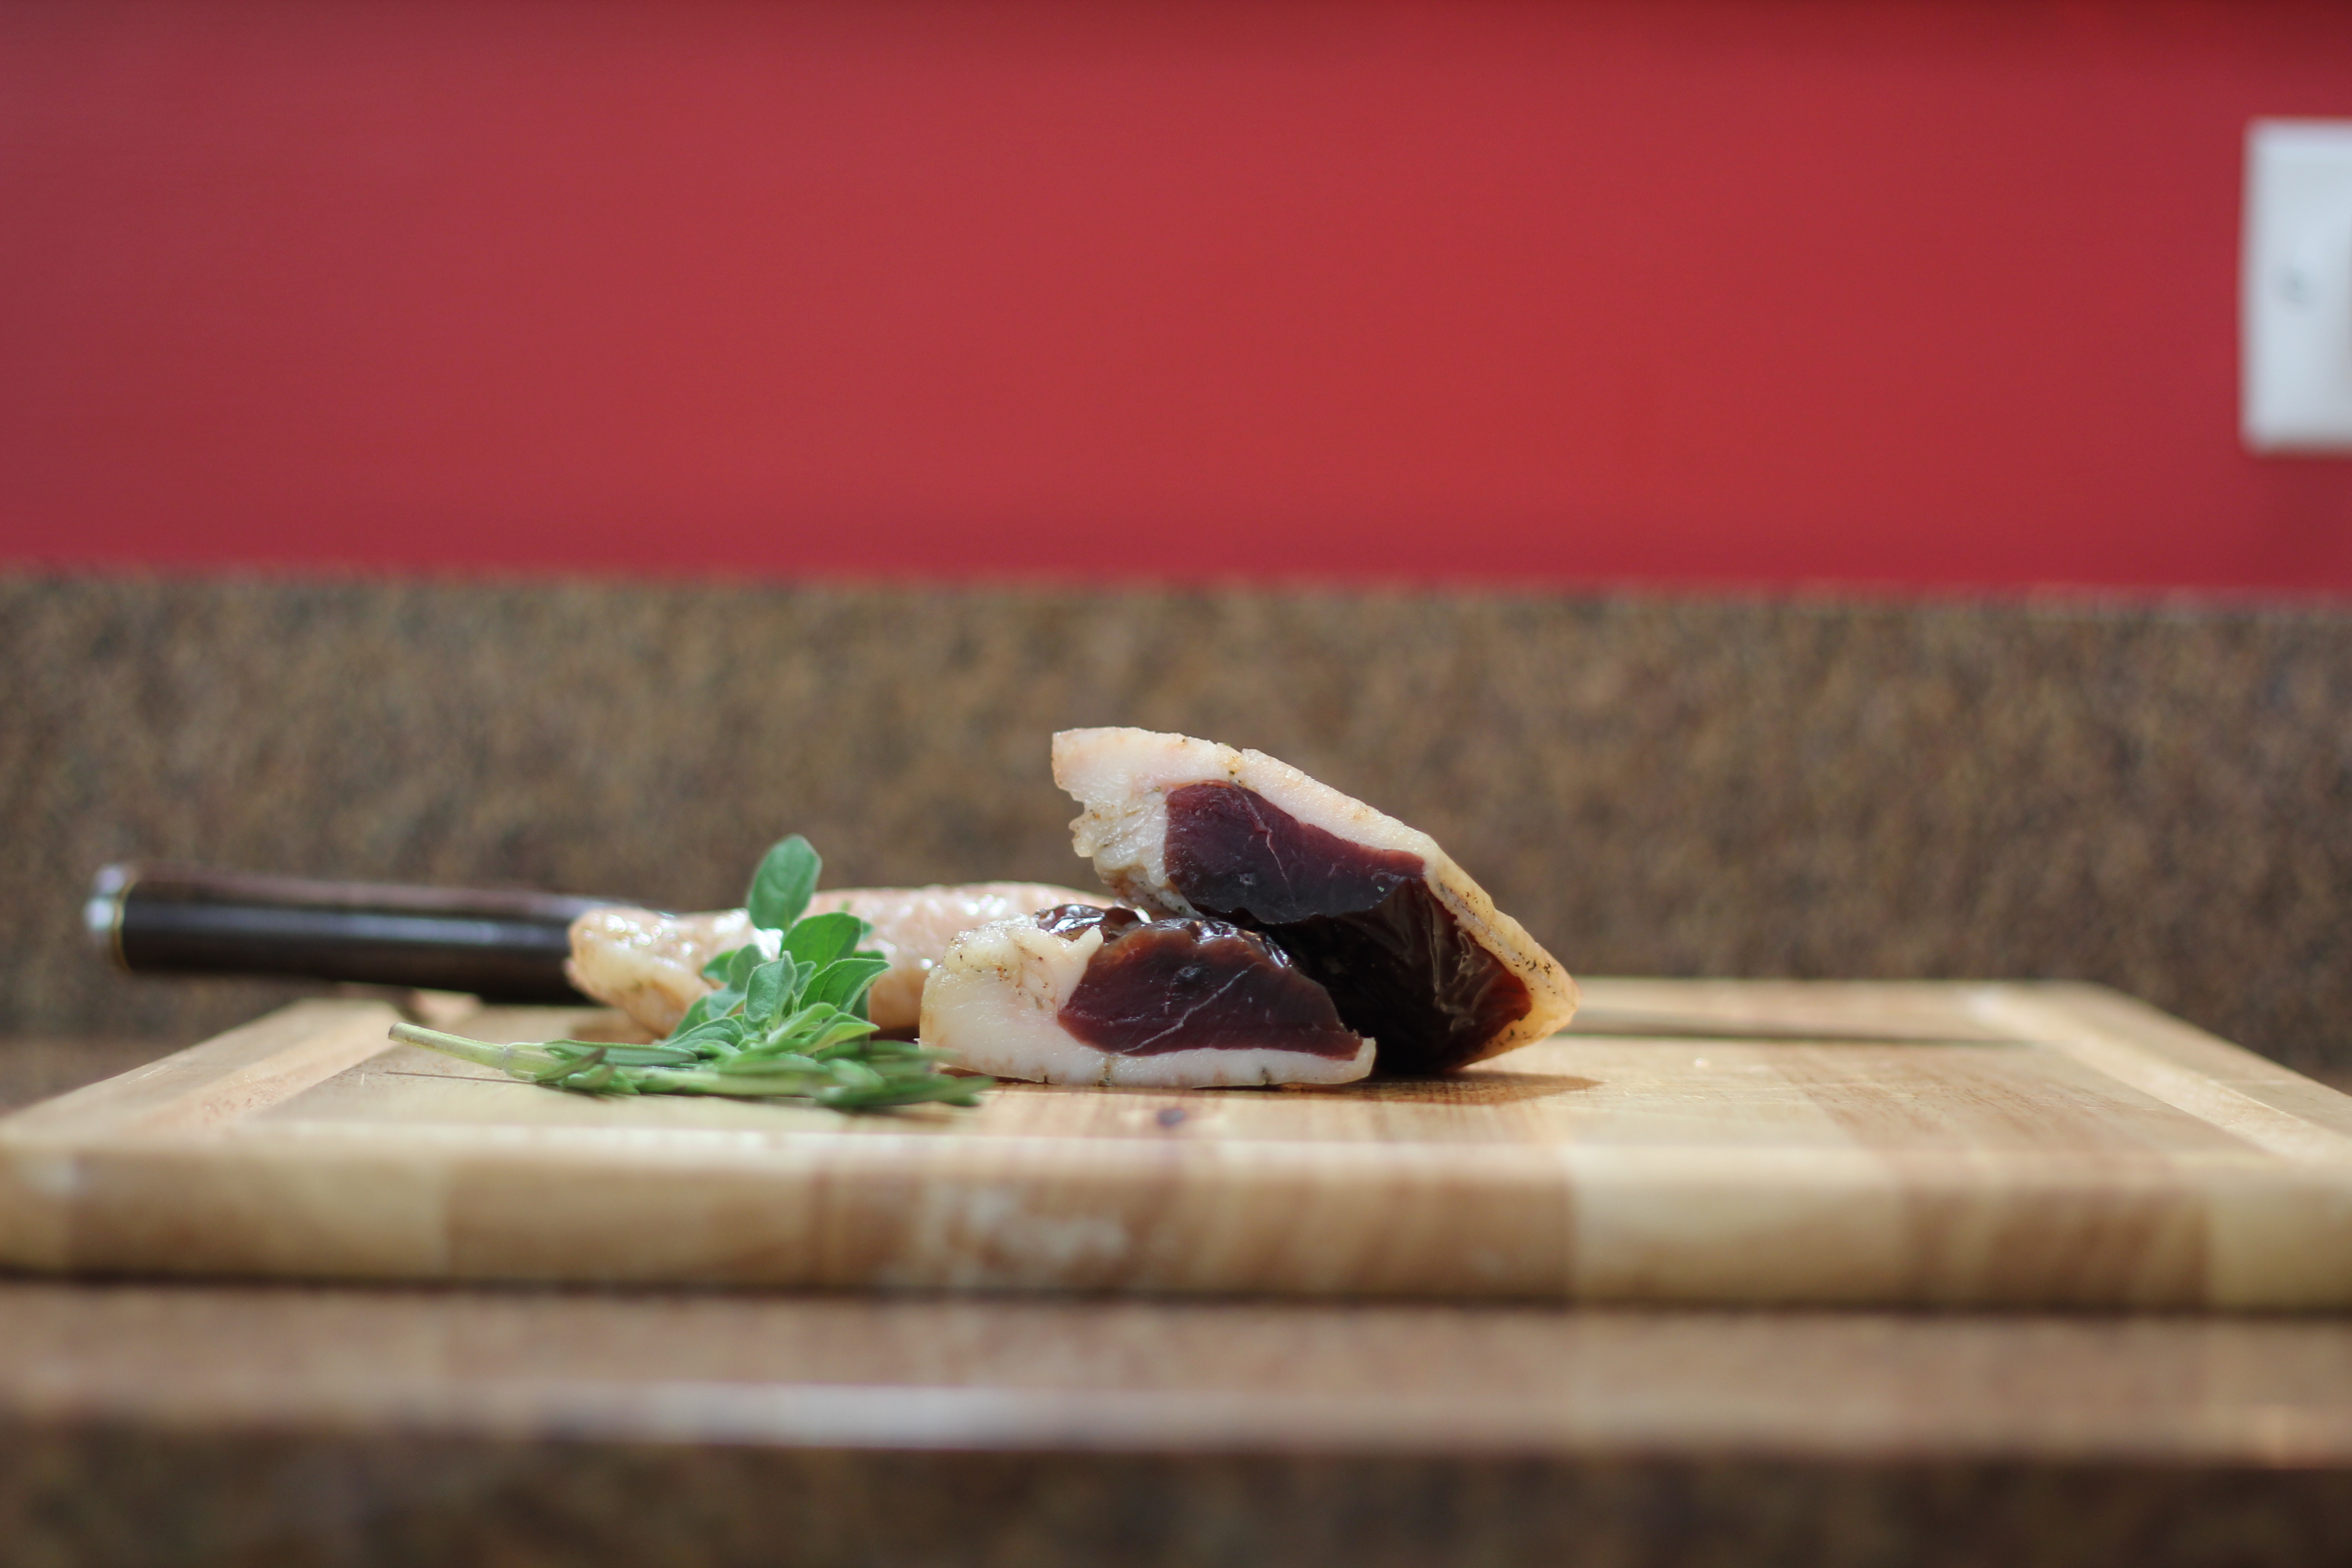 DryAgePro culinary ideas: Duck Prosciutto   DryAgePro.com